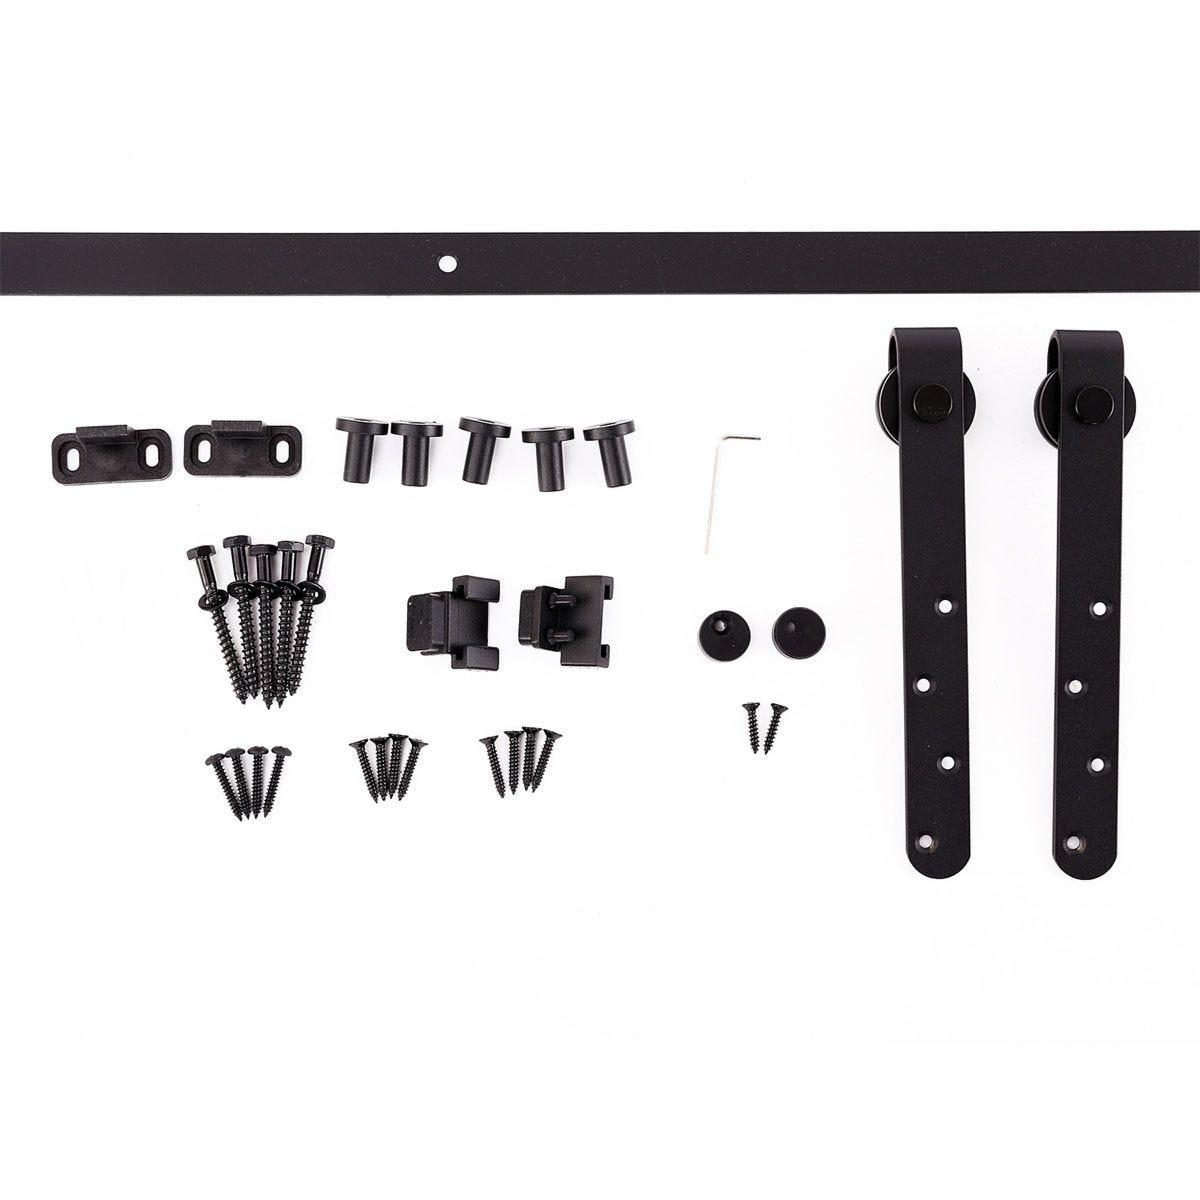 HOMCOM Steel 180cm Sliding Barn Door Hardware Kit - Black